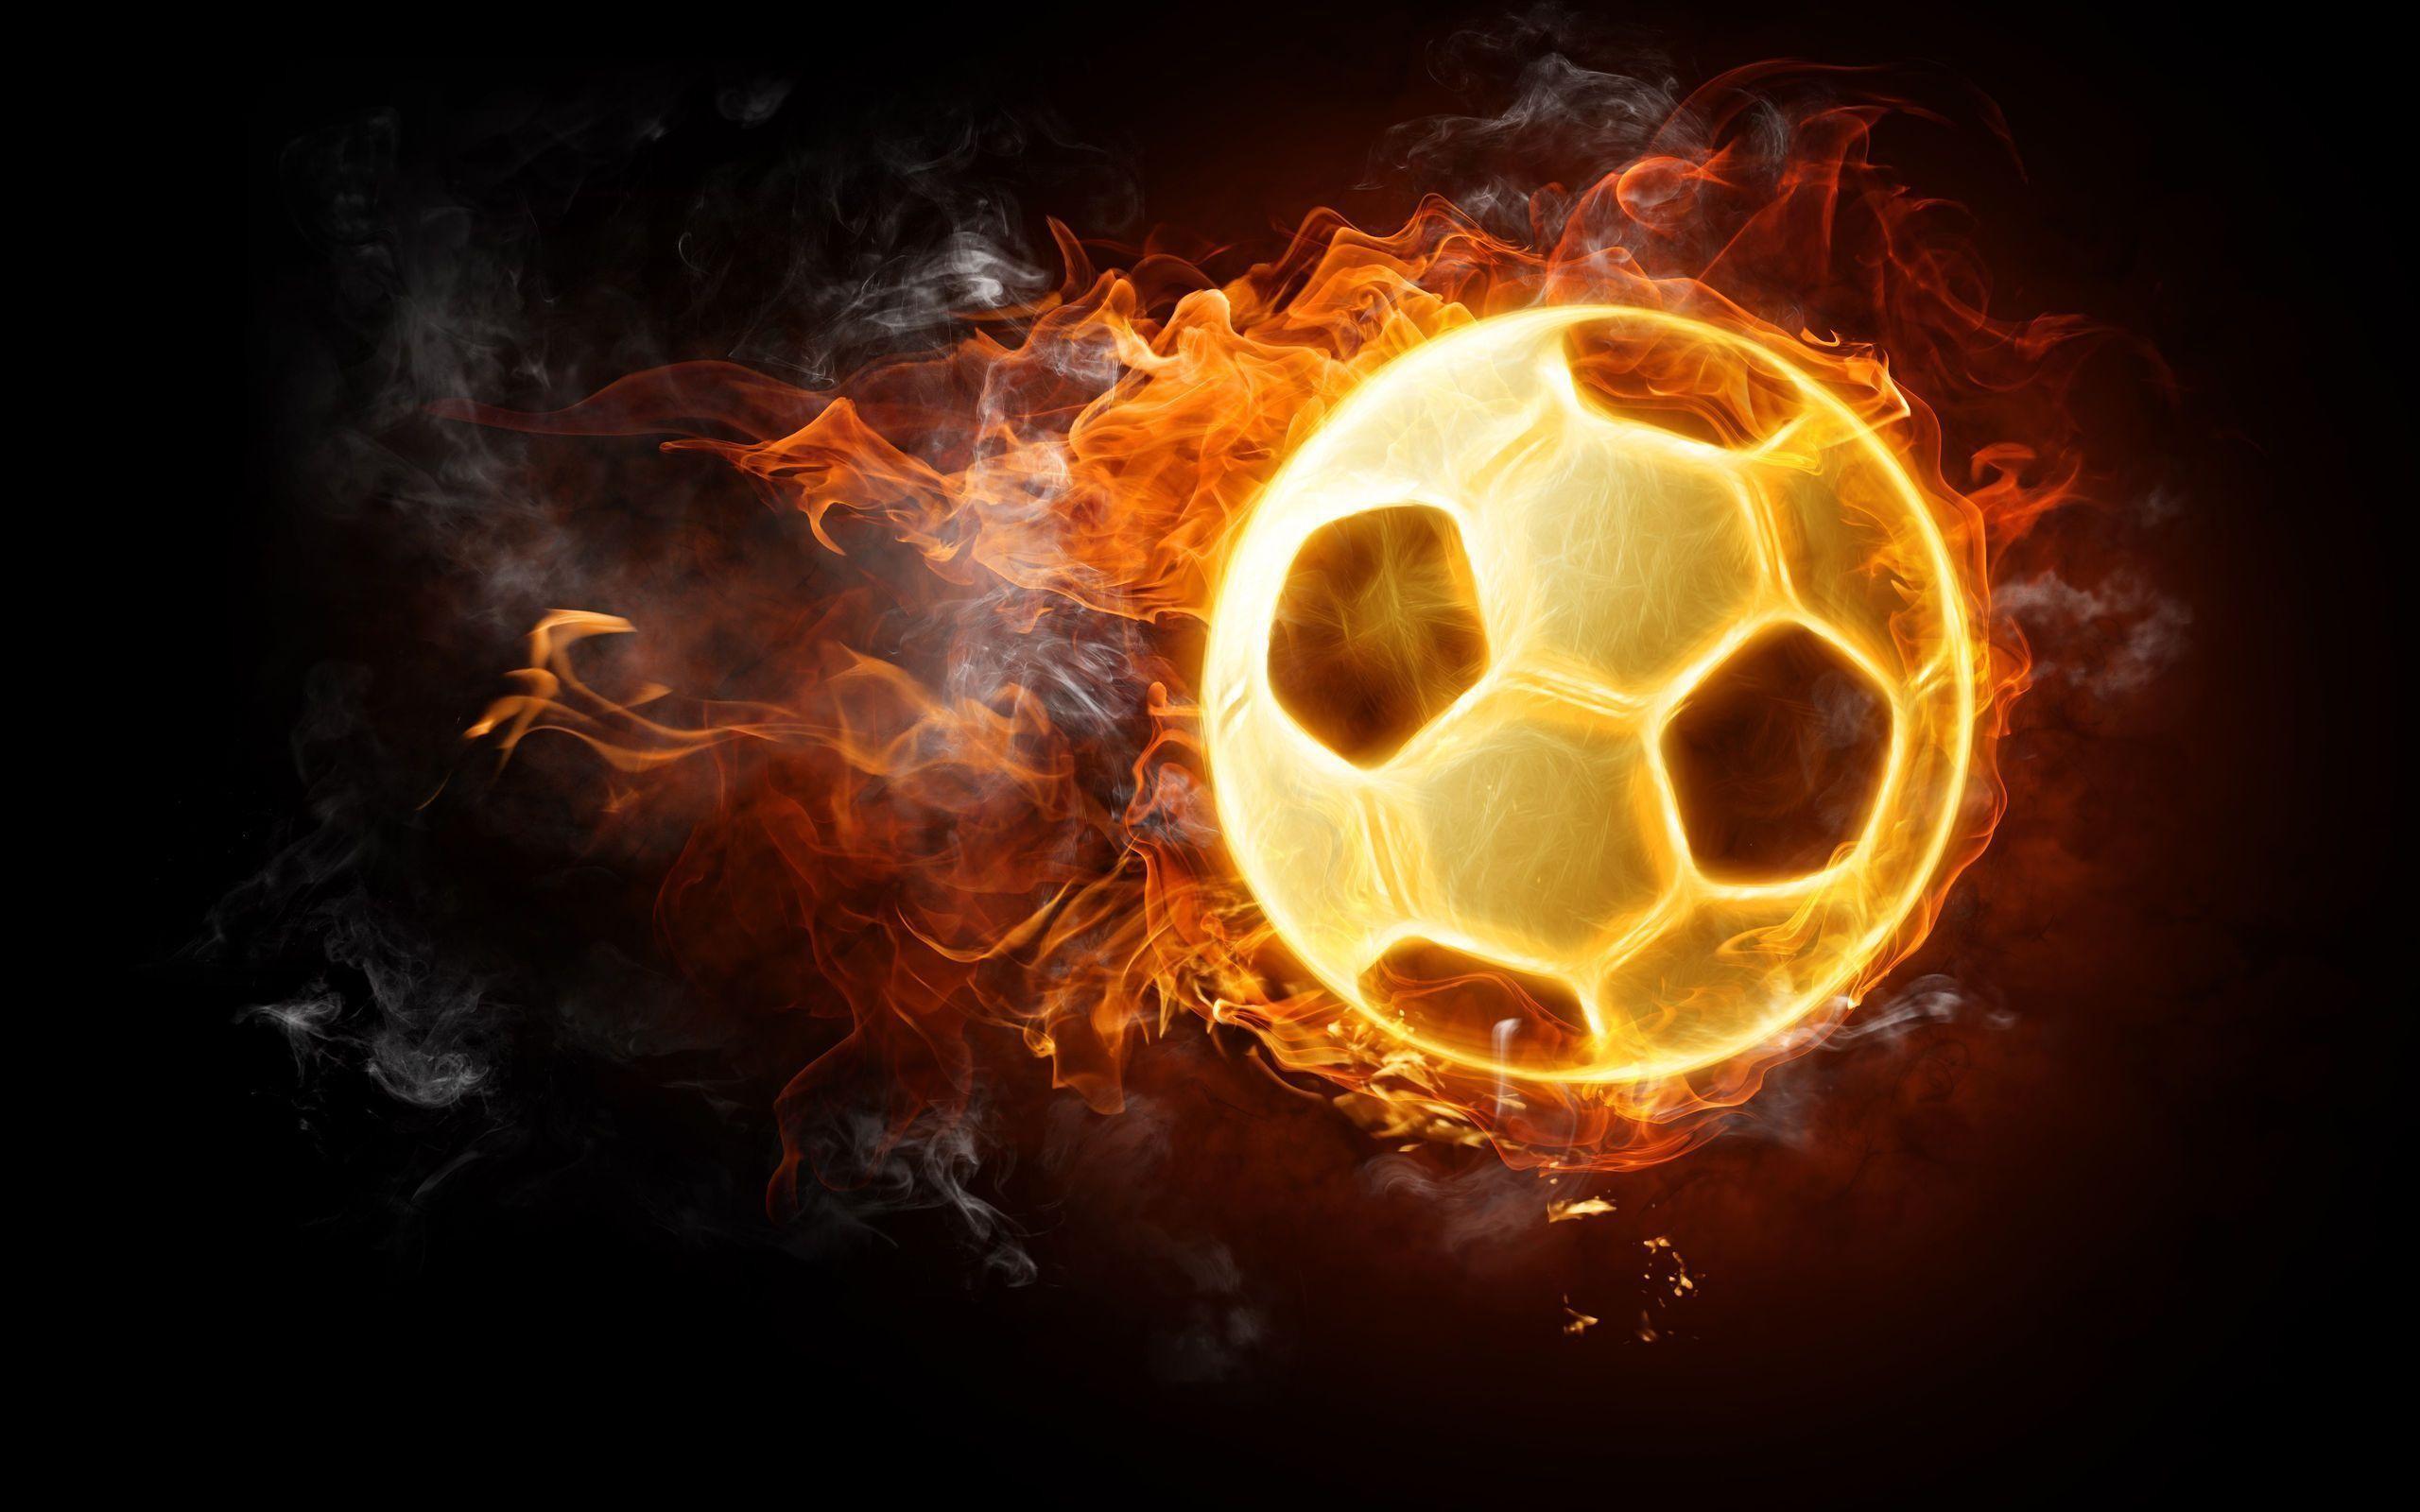 Cool Soccer Ball Wallpaper For Desktop Background 13 HD Wallpapers .